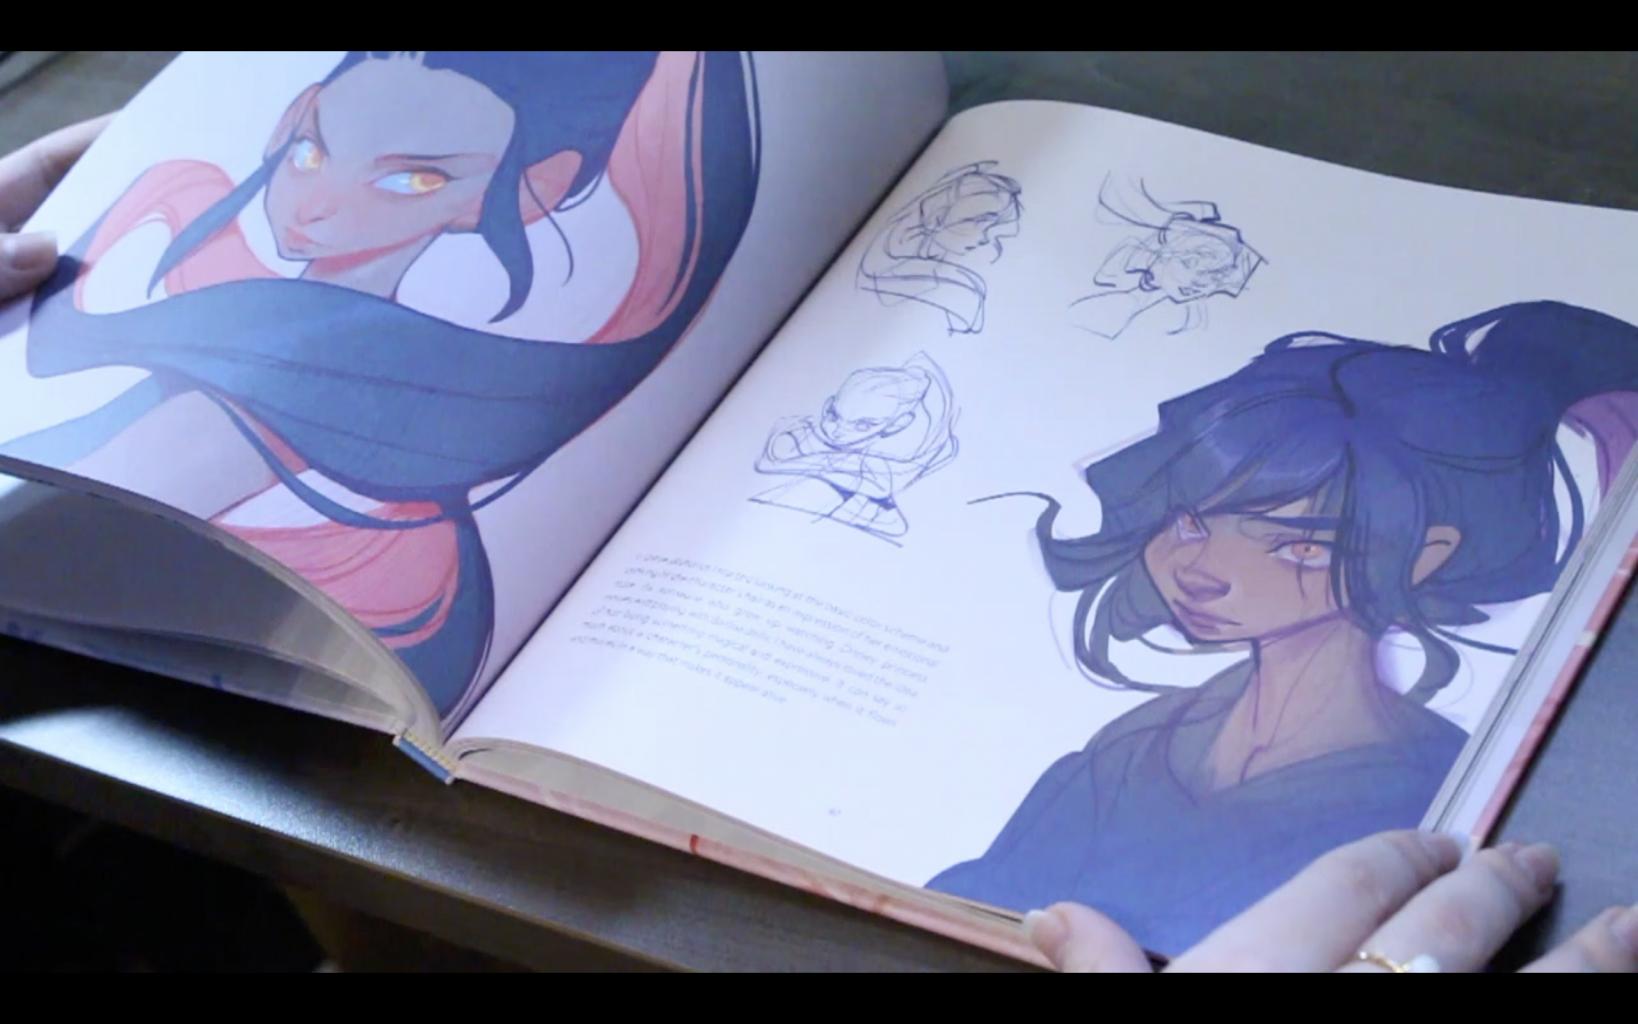 The Sketchbook Of Loish: Art In Progress (+Video Unboxing And Flip Through)Departure